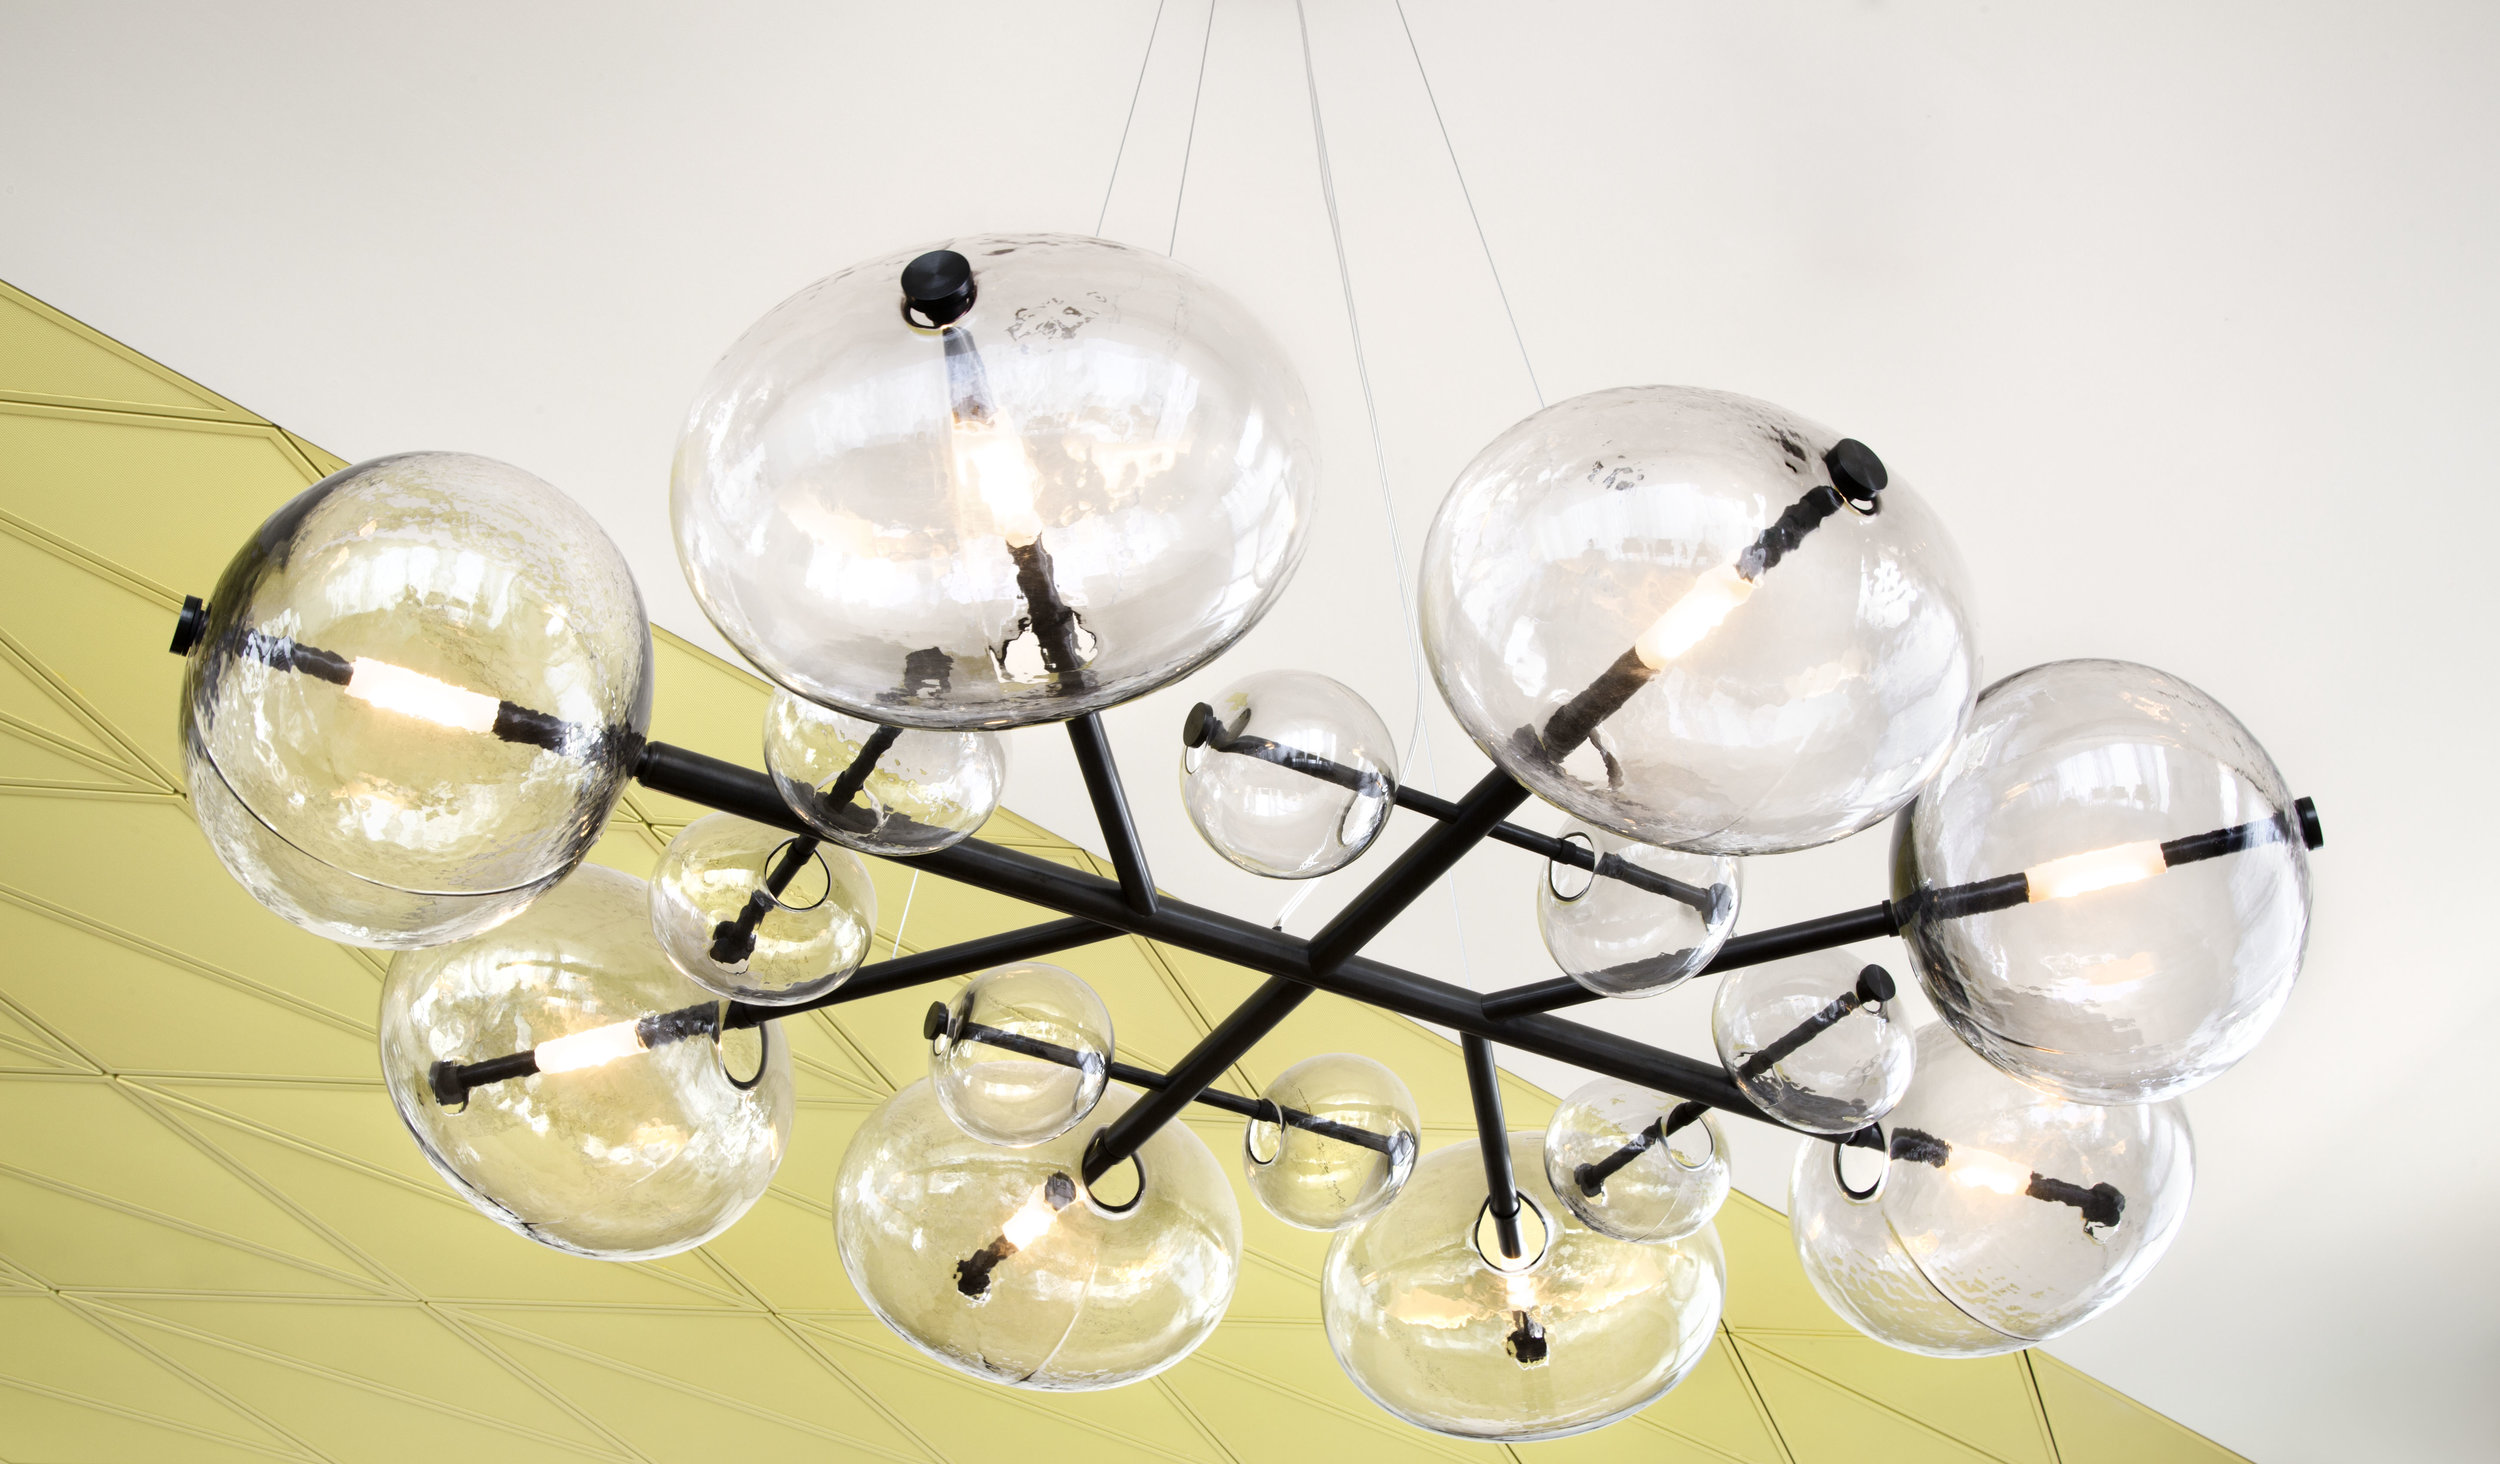 b-tomic-light_lighting-design_coordination-berlin_01.jpg